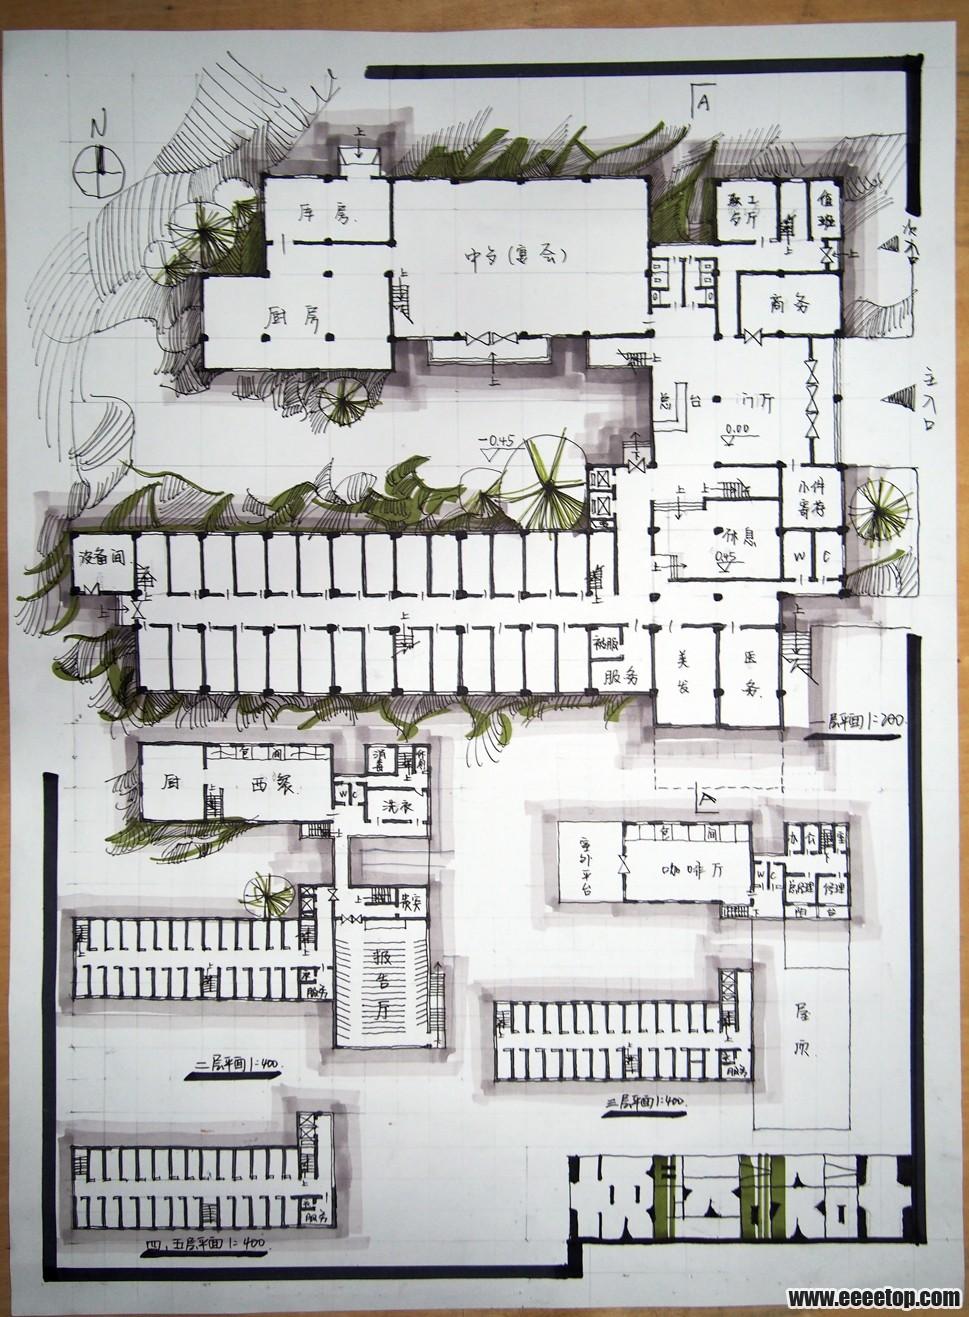 【yp】旅馆快题练习——望指点 - 大学生设计广场 - e图片